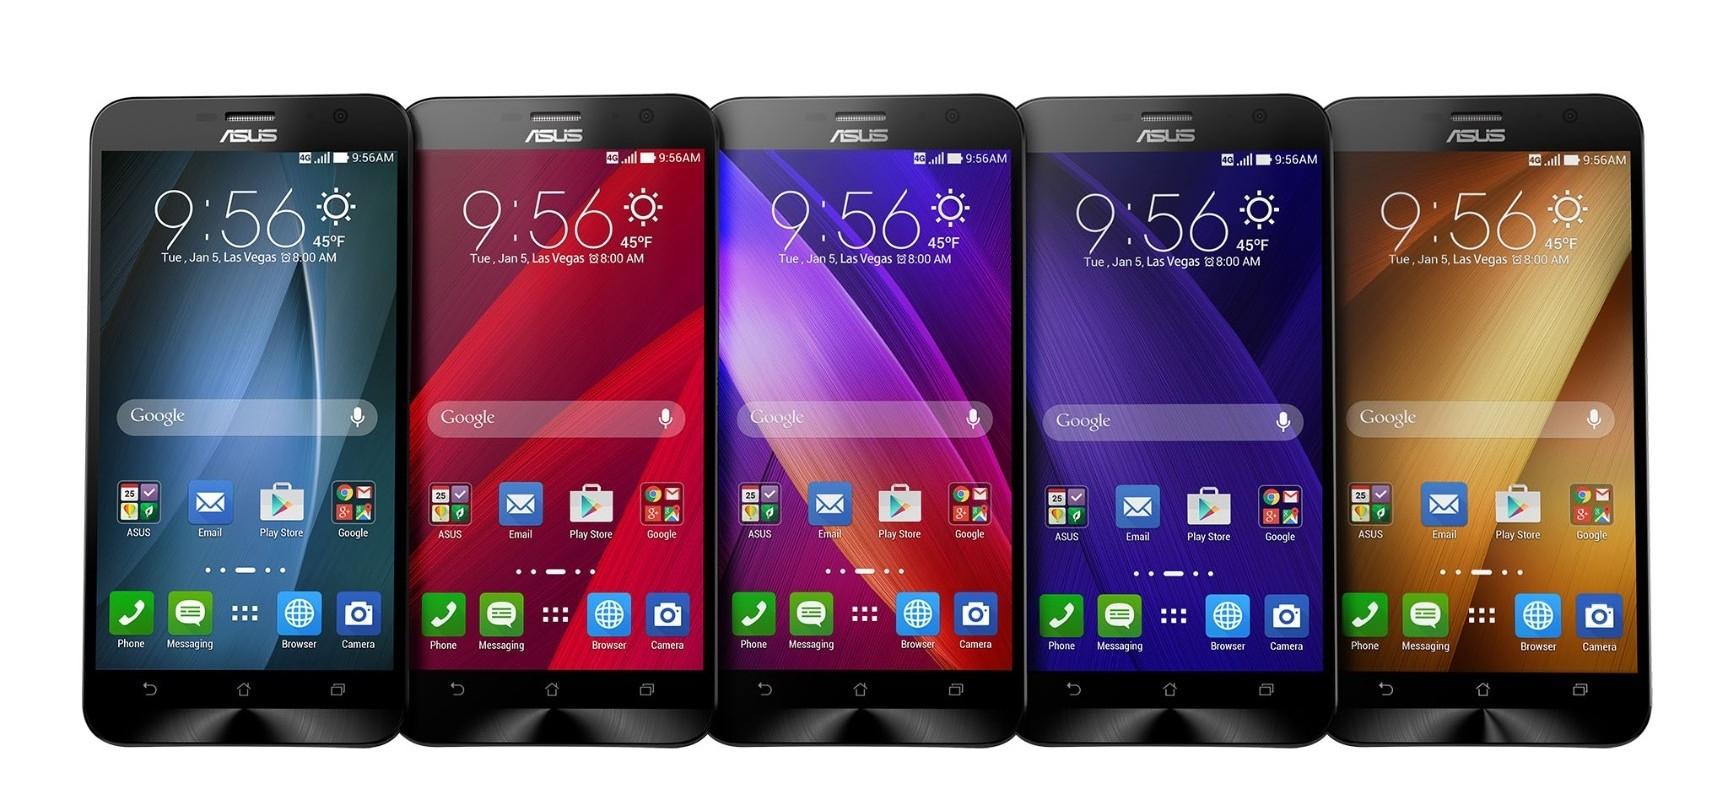 Asus Zenfone 2 analisis español-Android